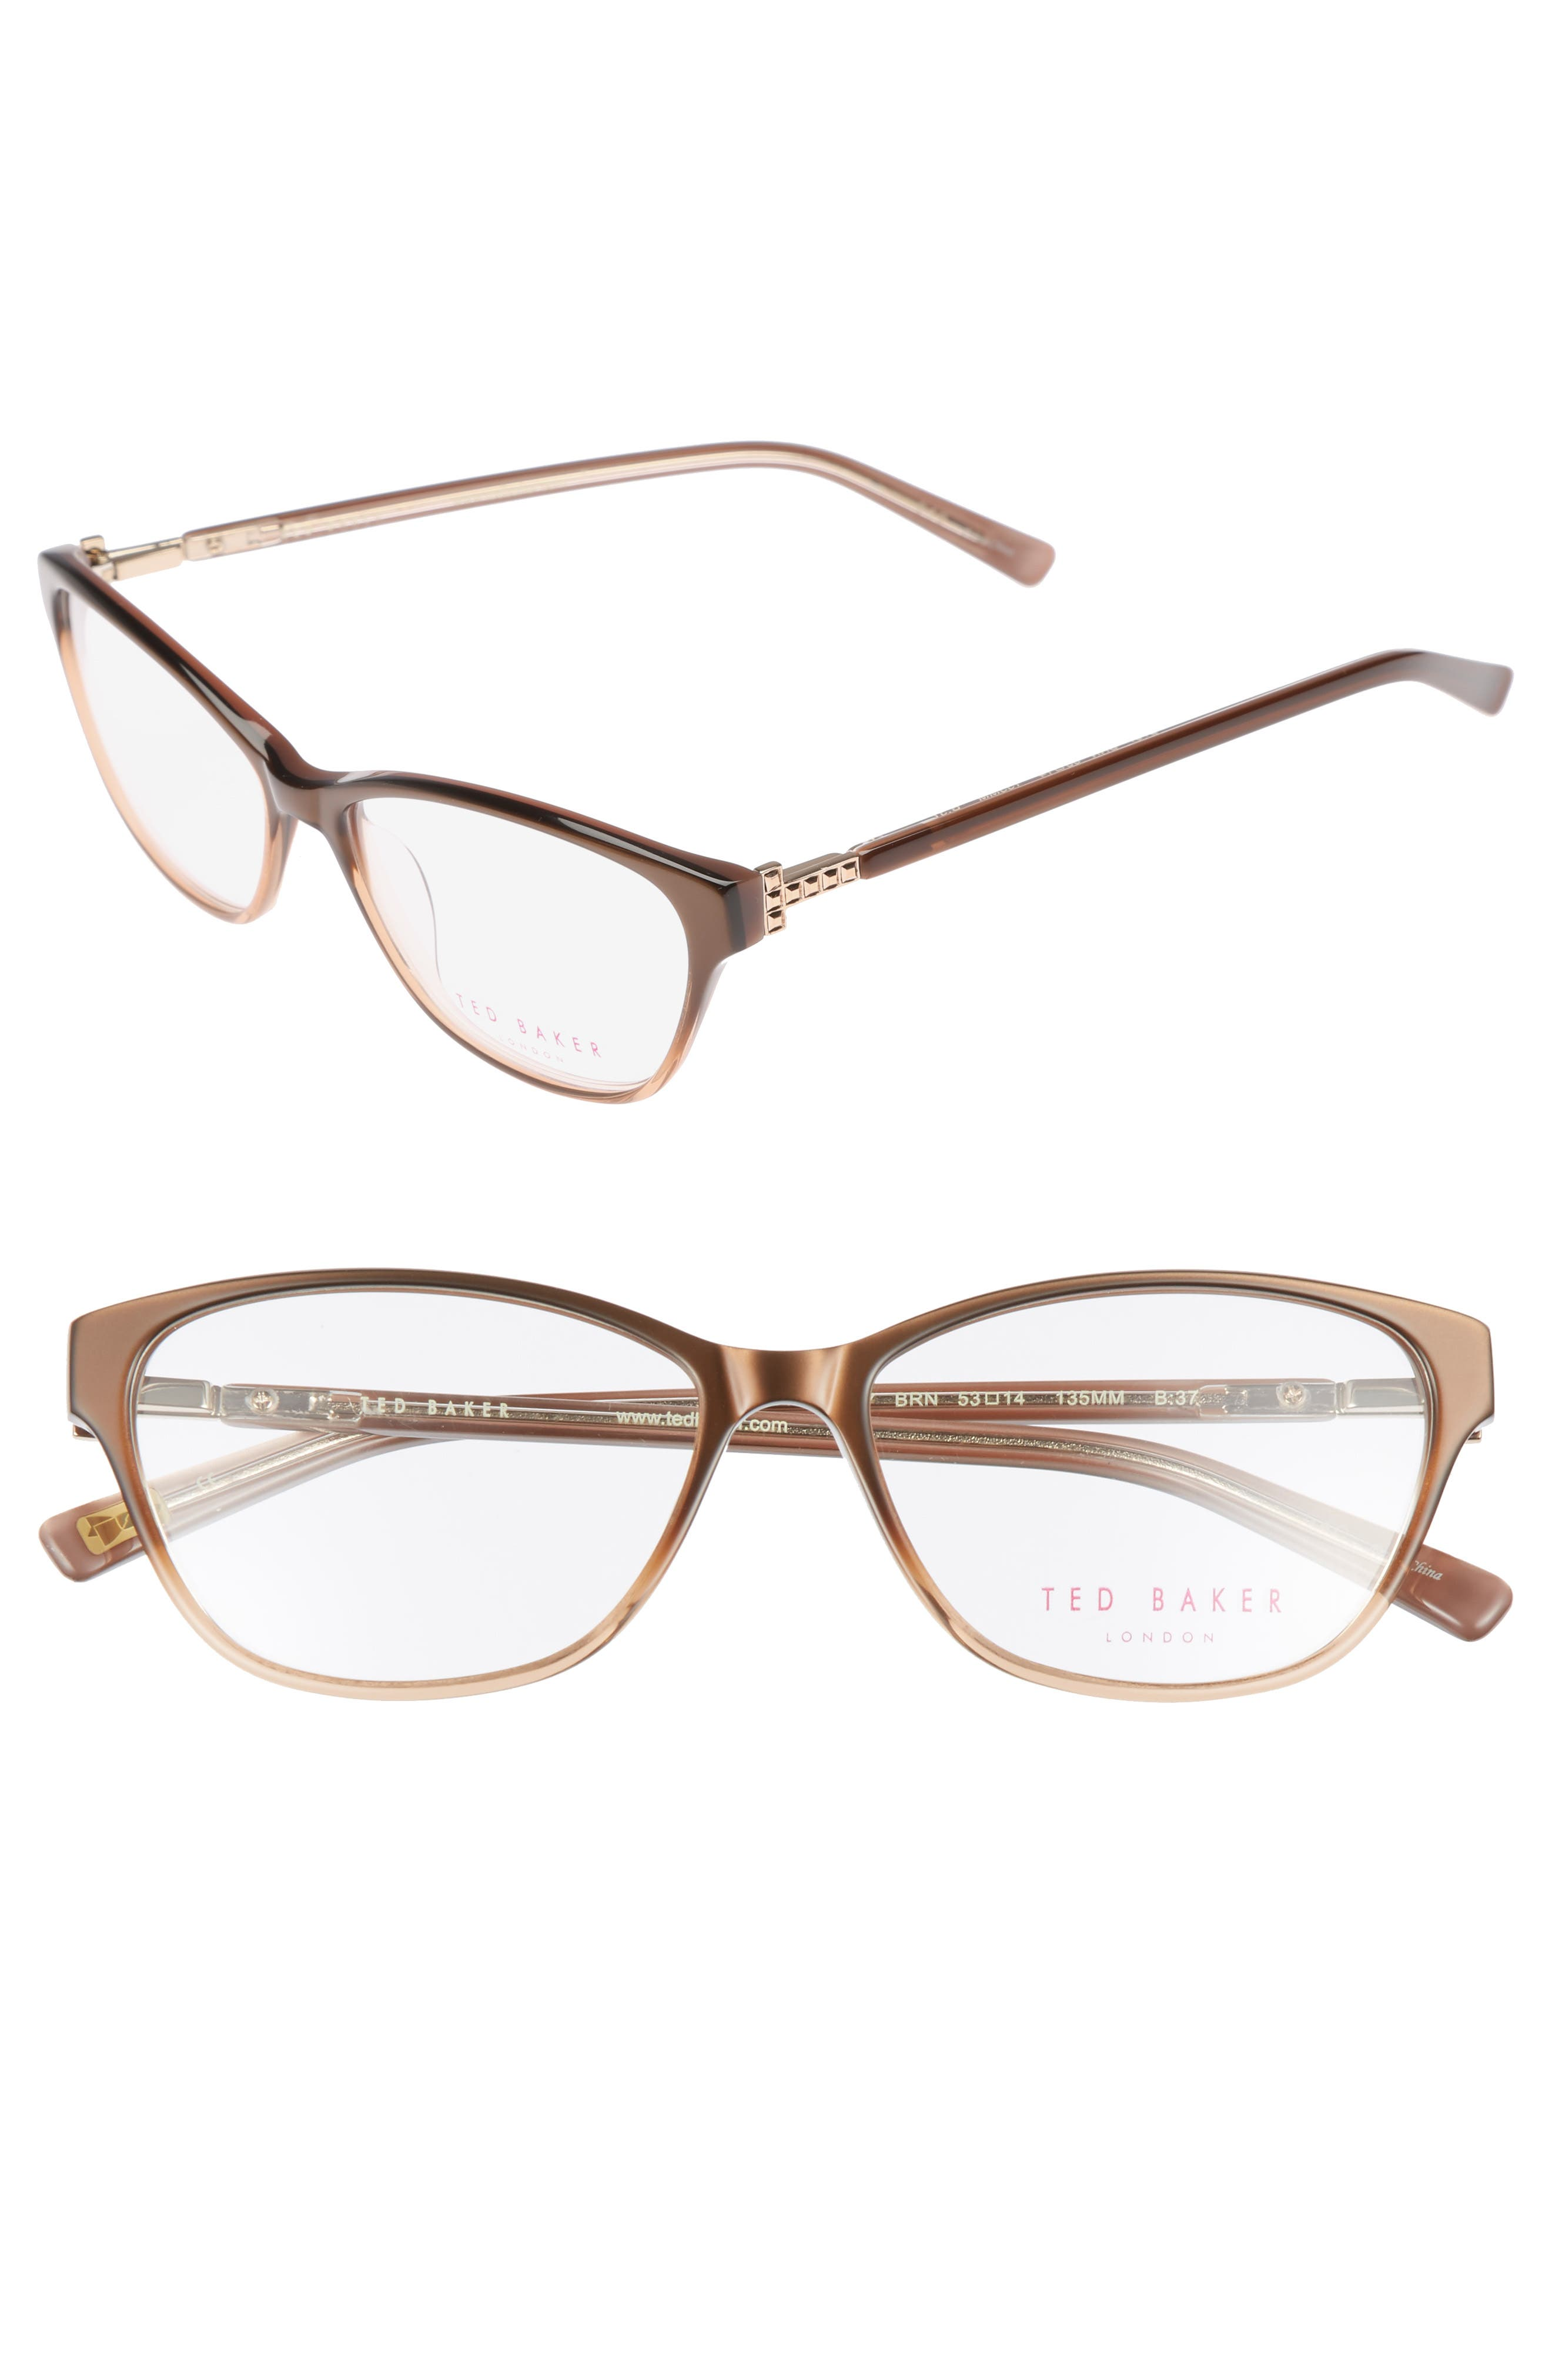 53mm Optical Cat Eye Glasses,                             Main thumbnail 1, color,